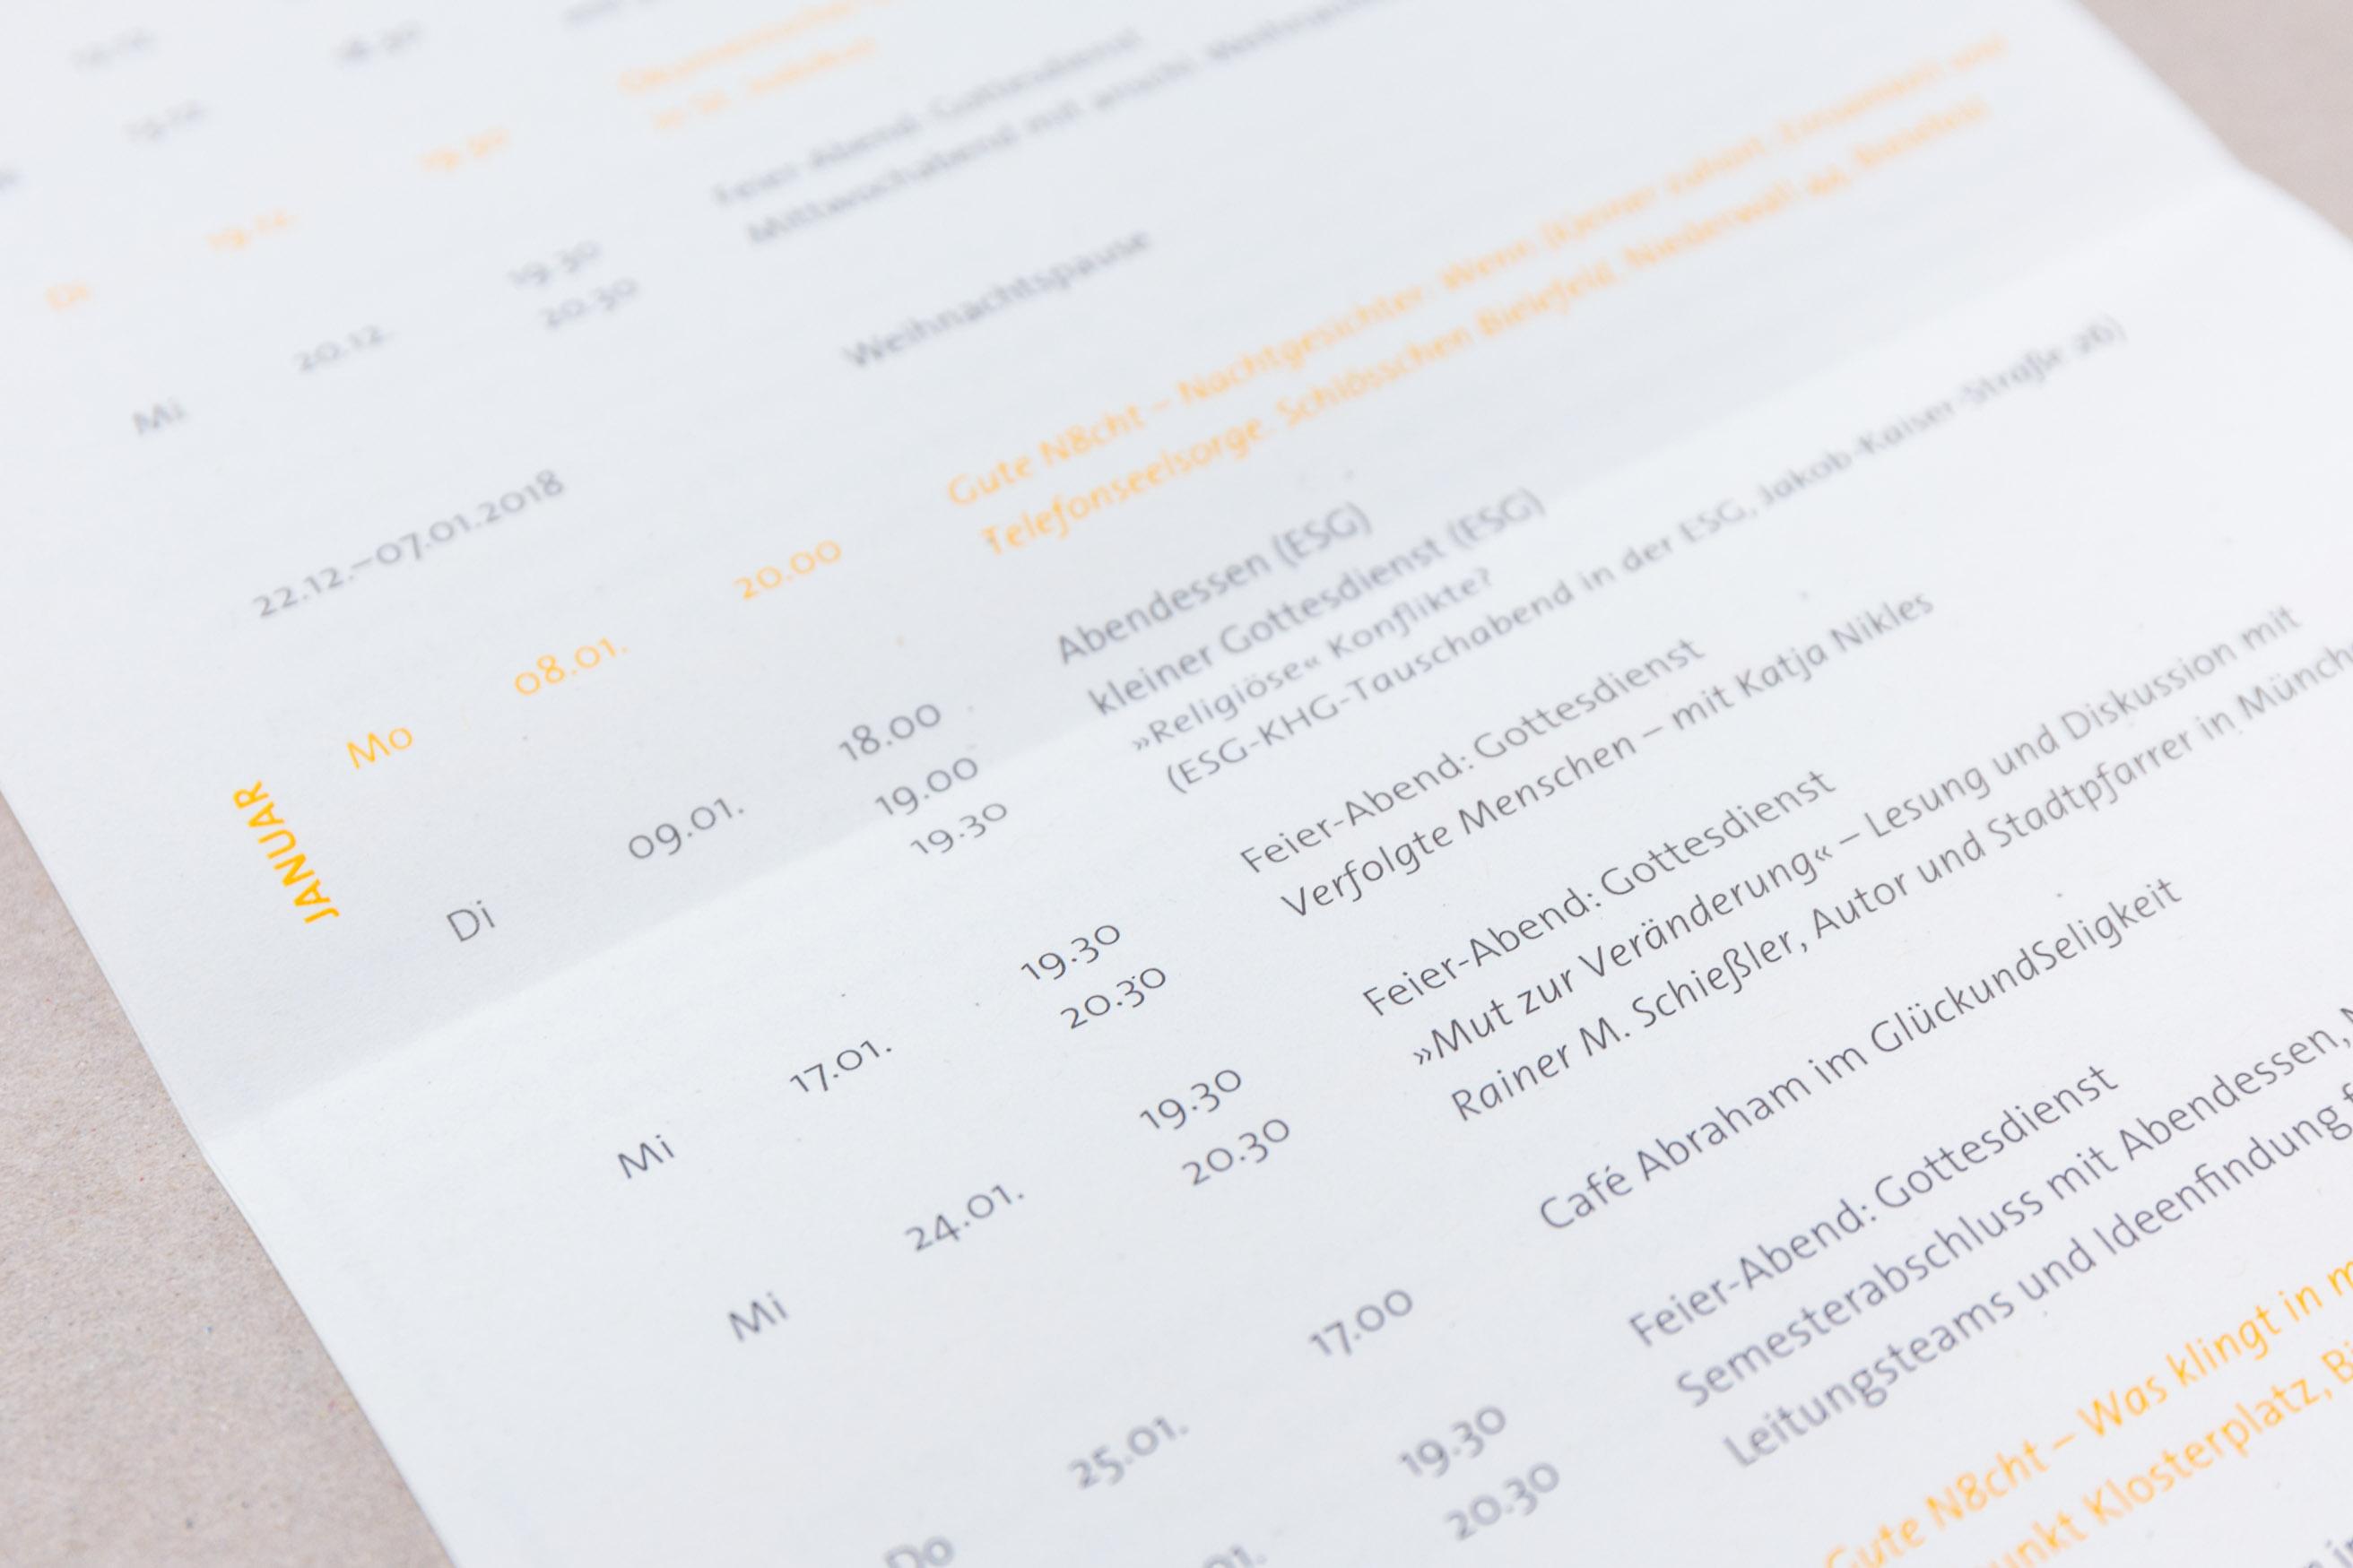 KHG Bielefeld Semesterprogramm, Detail Kalender